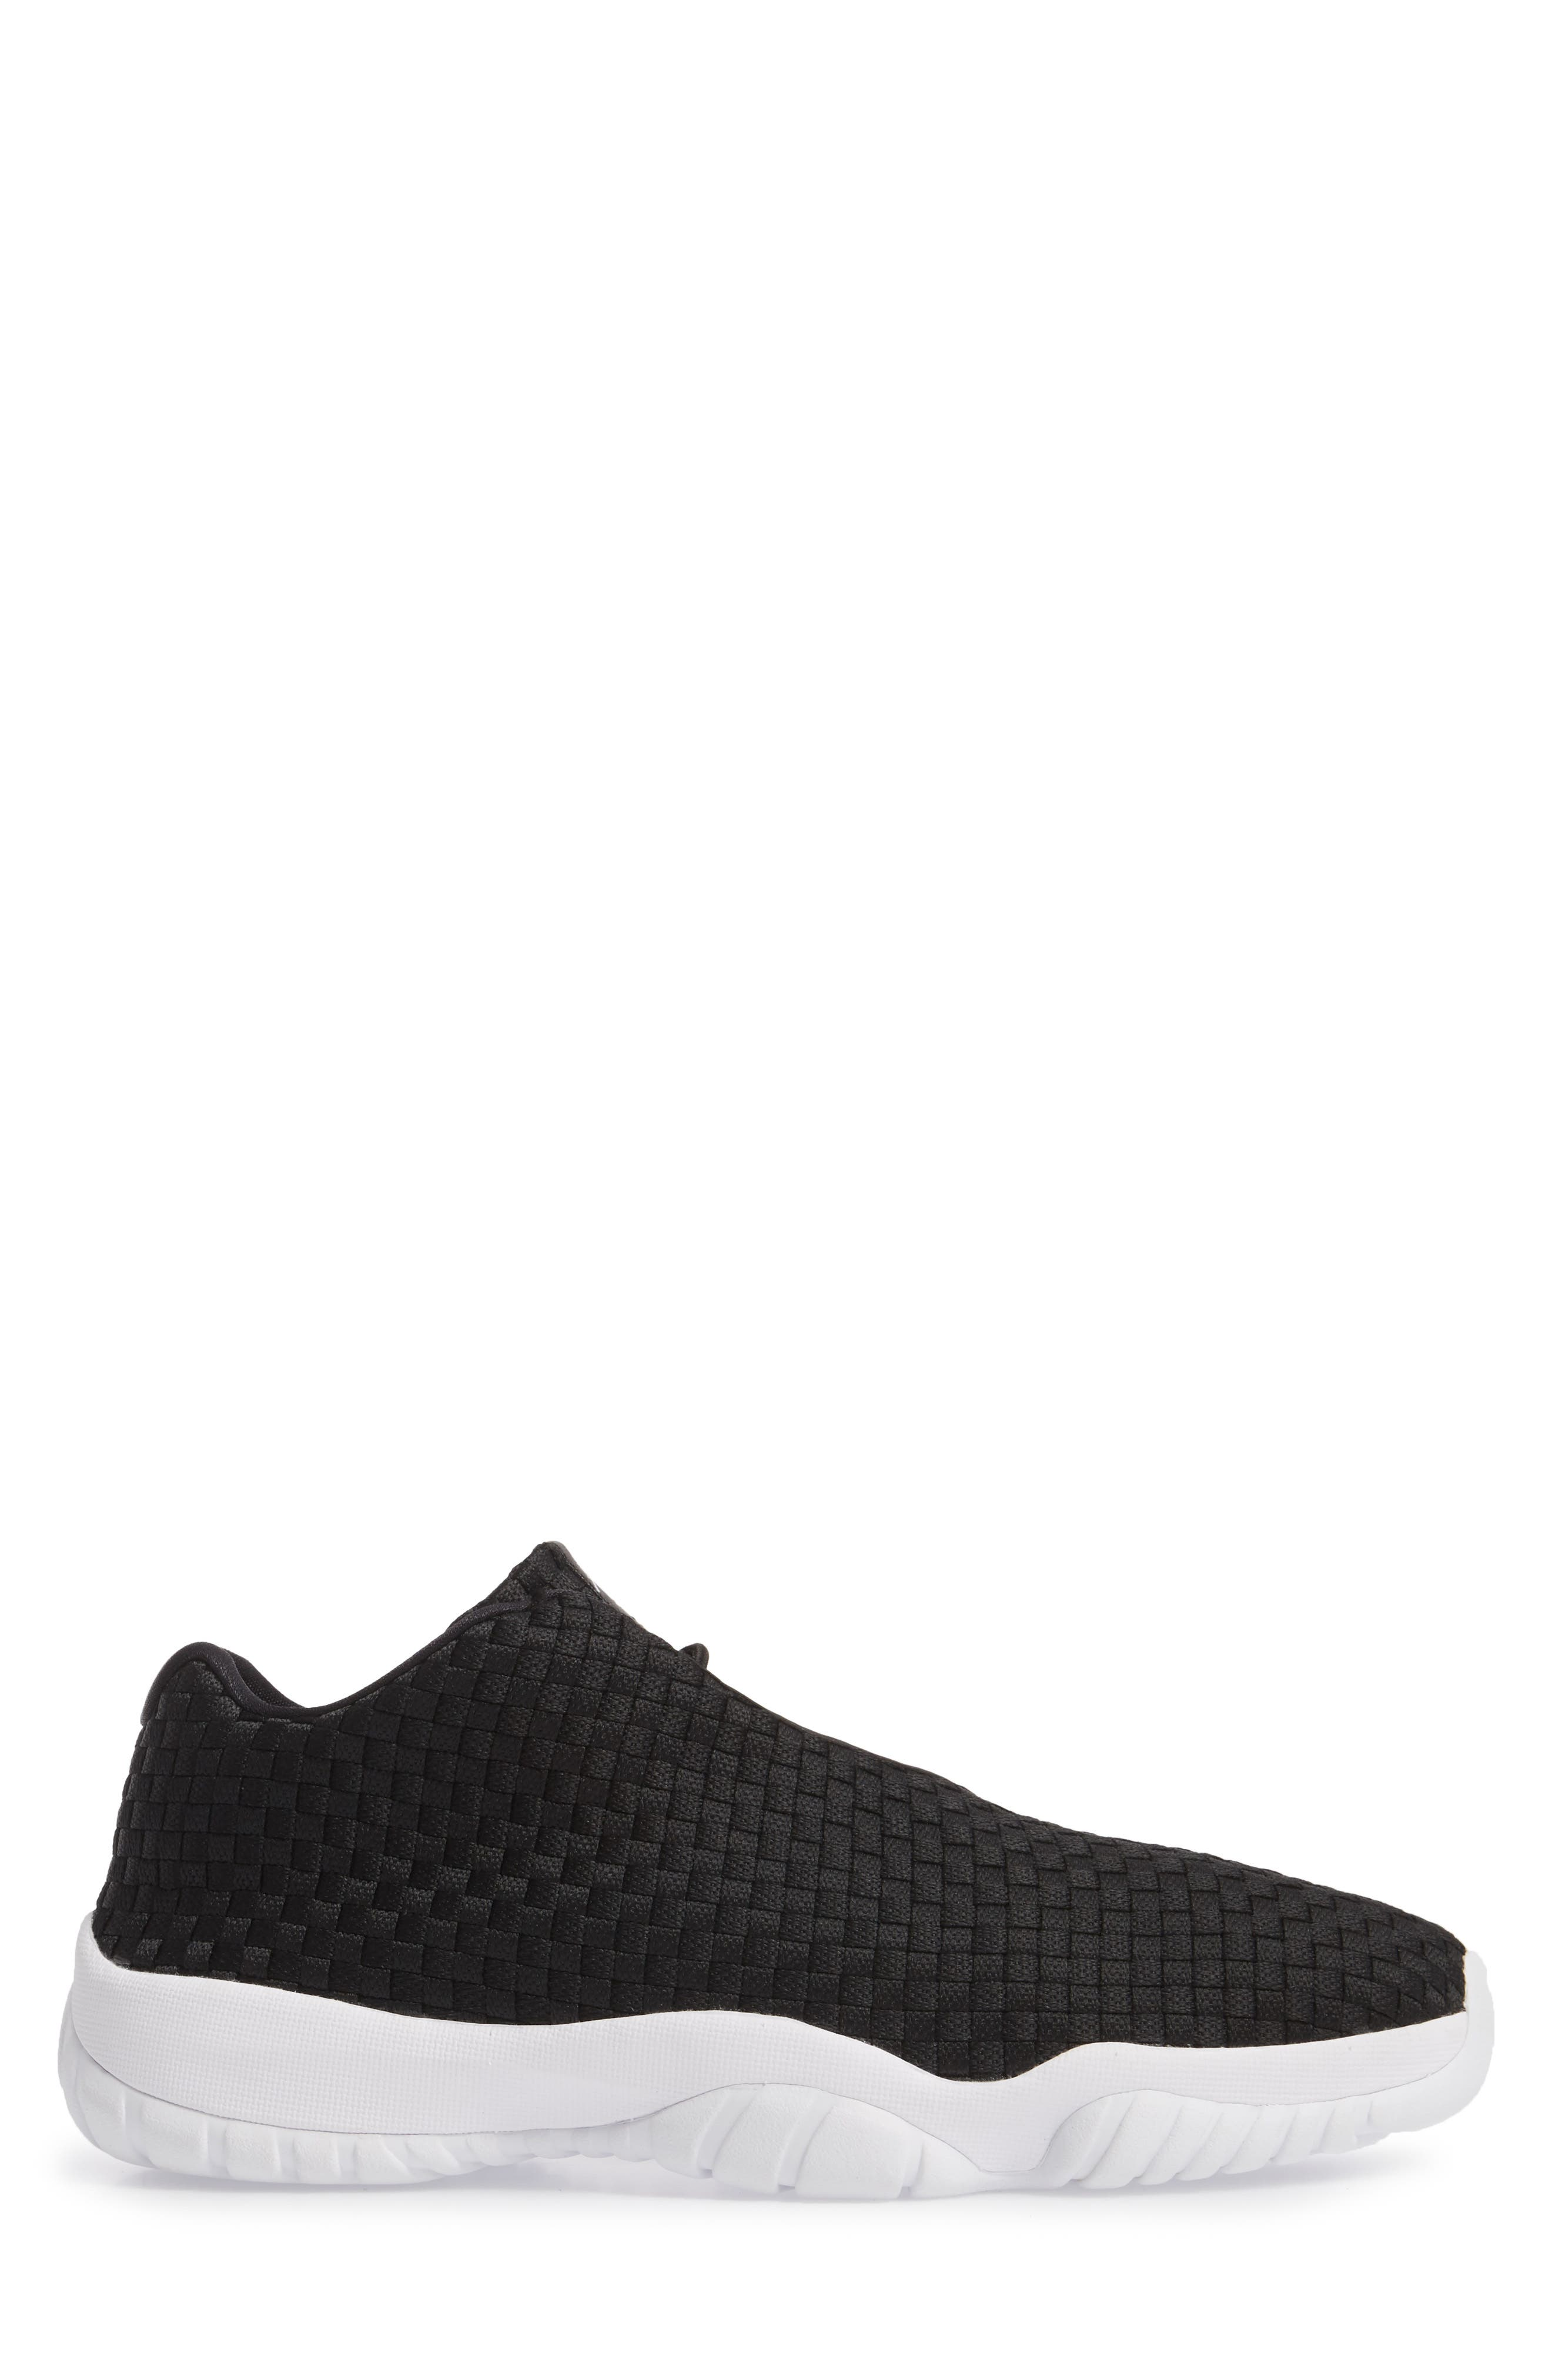 Air Jordan Future Woven Sneaker,                             Alternate thumbnail 3, color,                             002